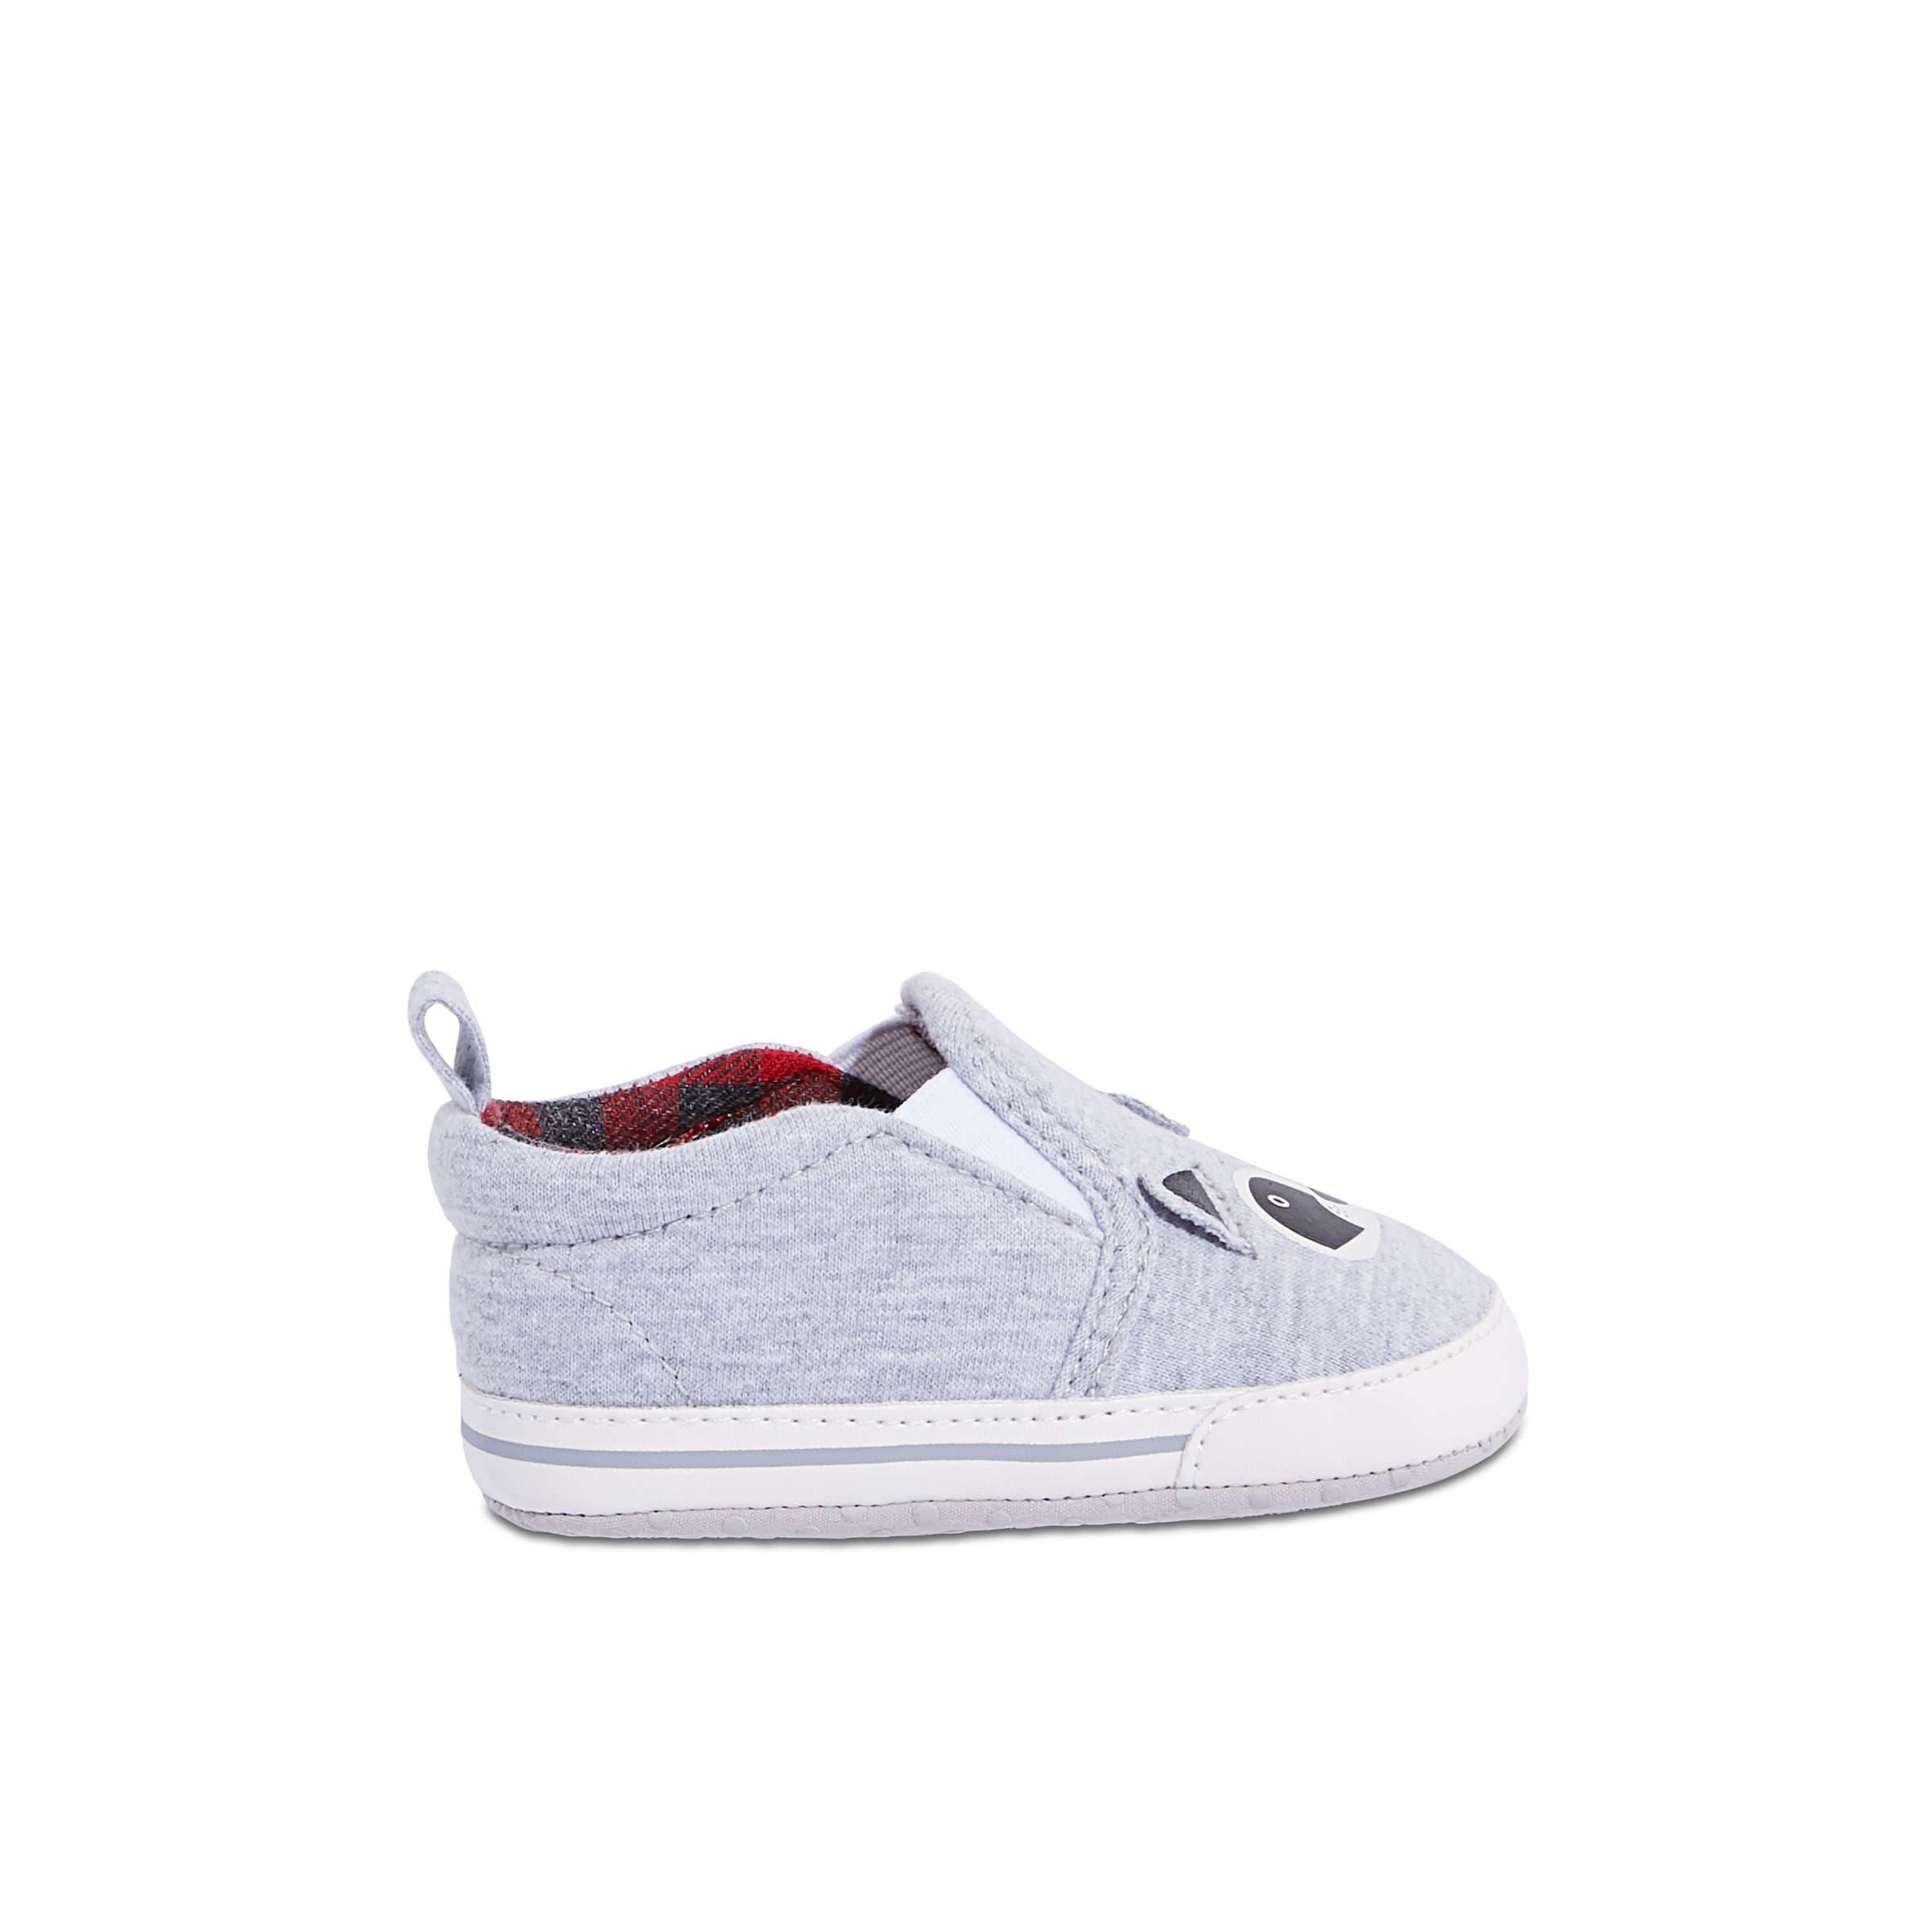 1577e00c23c7c Joe Fresh Baby Boys' Raccoon Sneakers